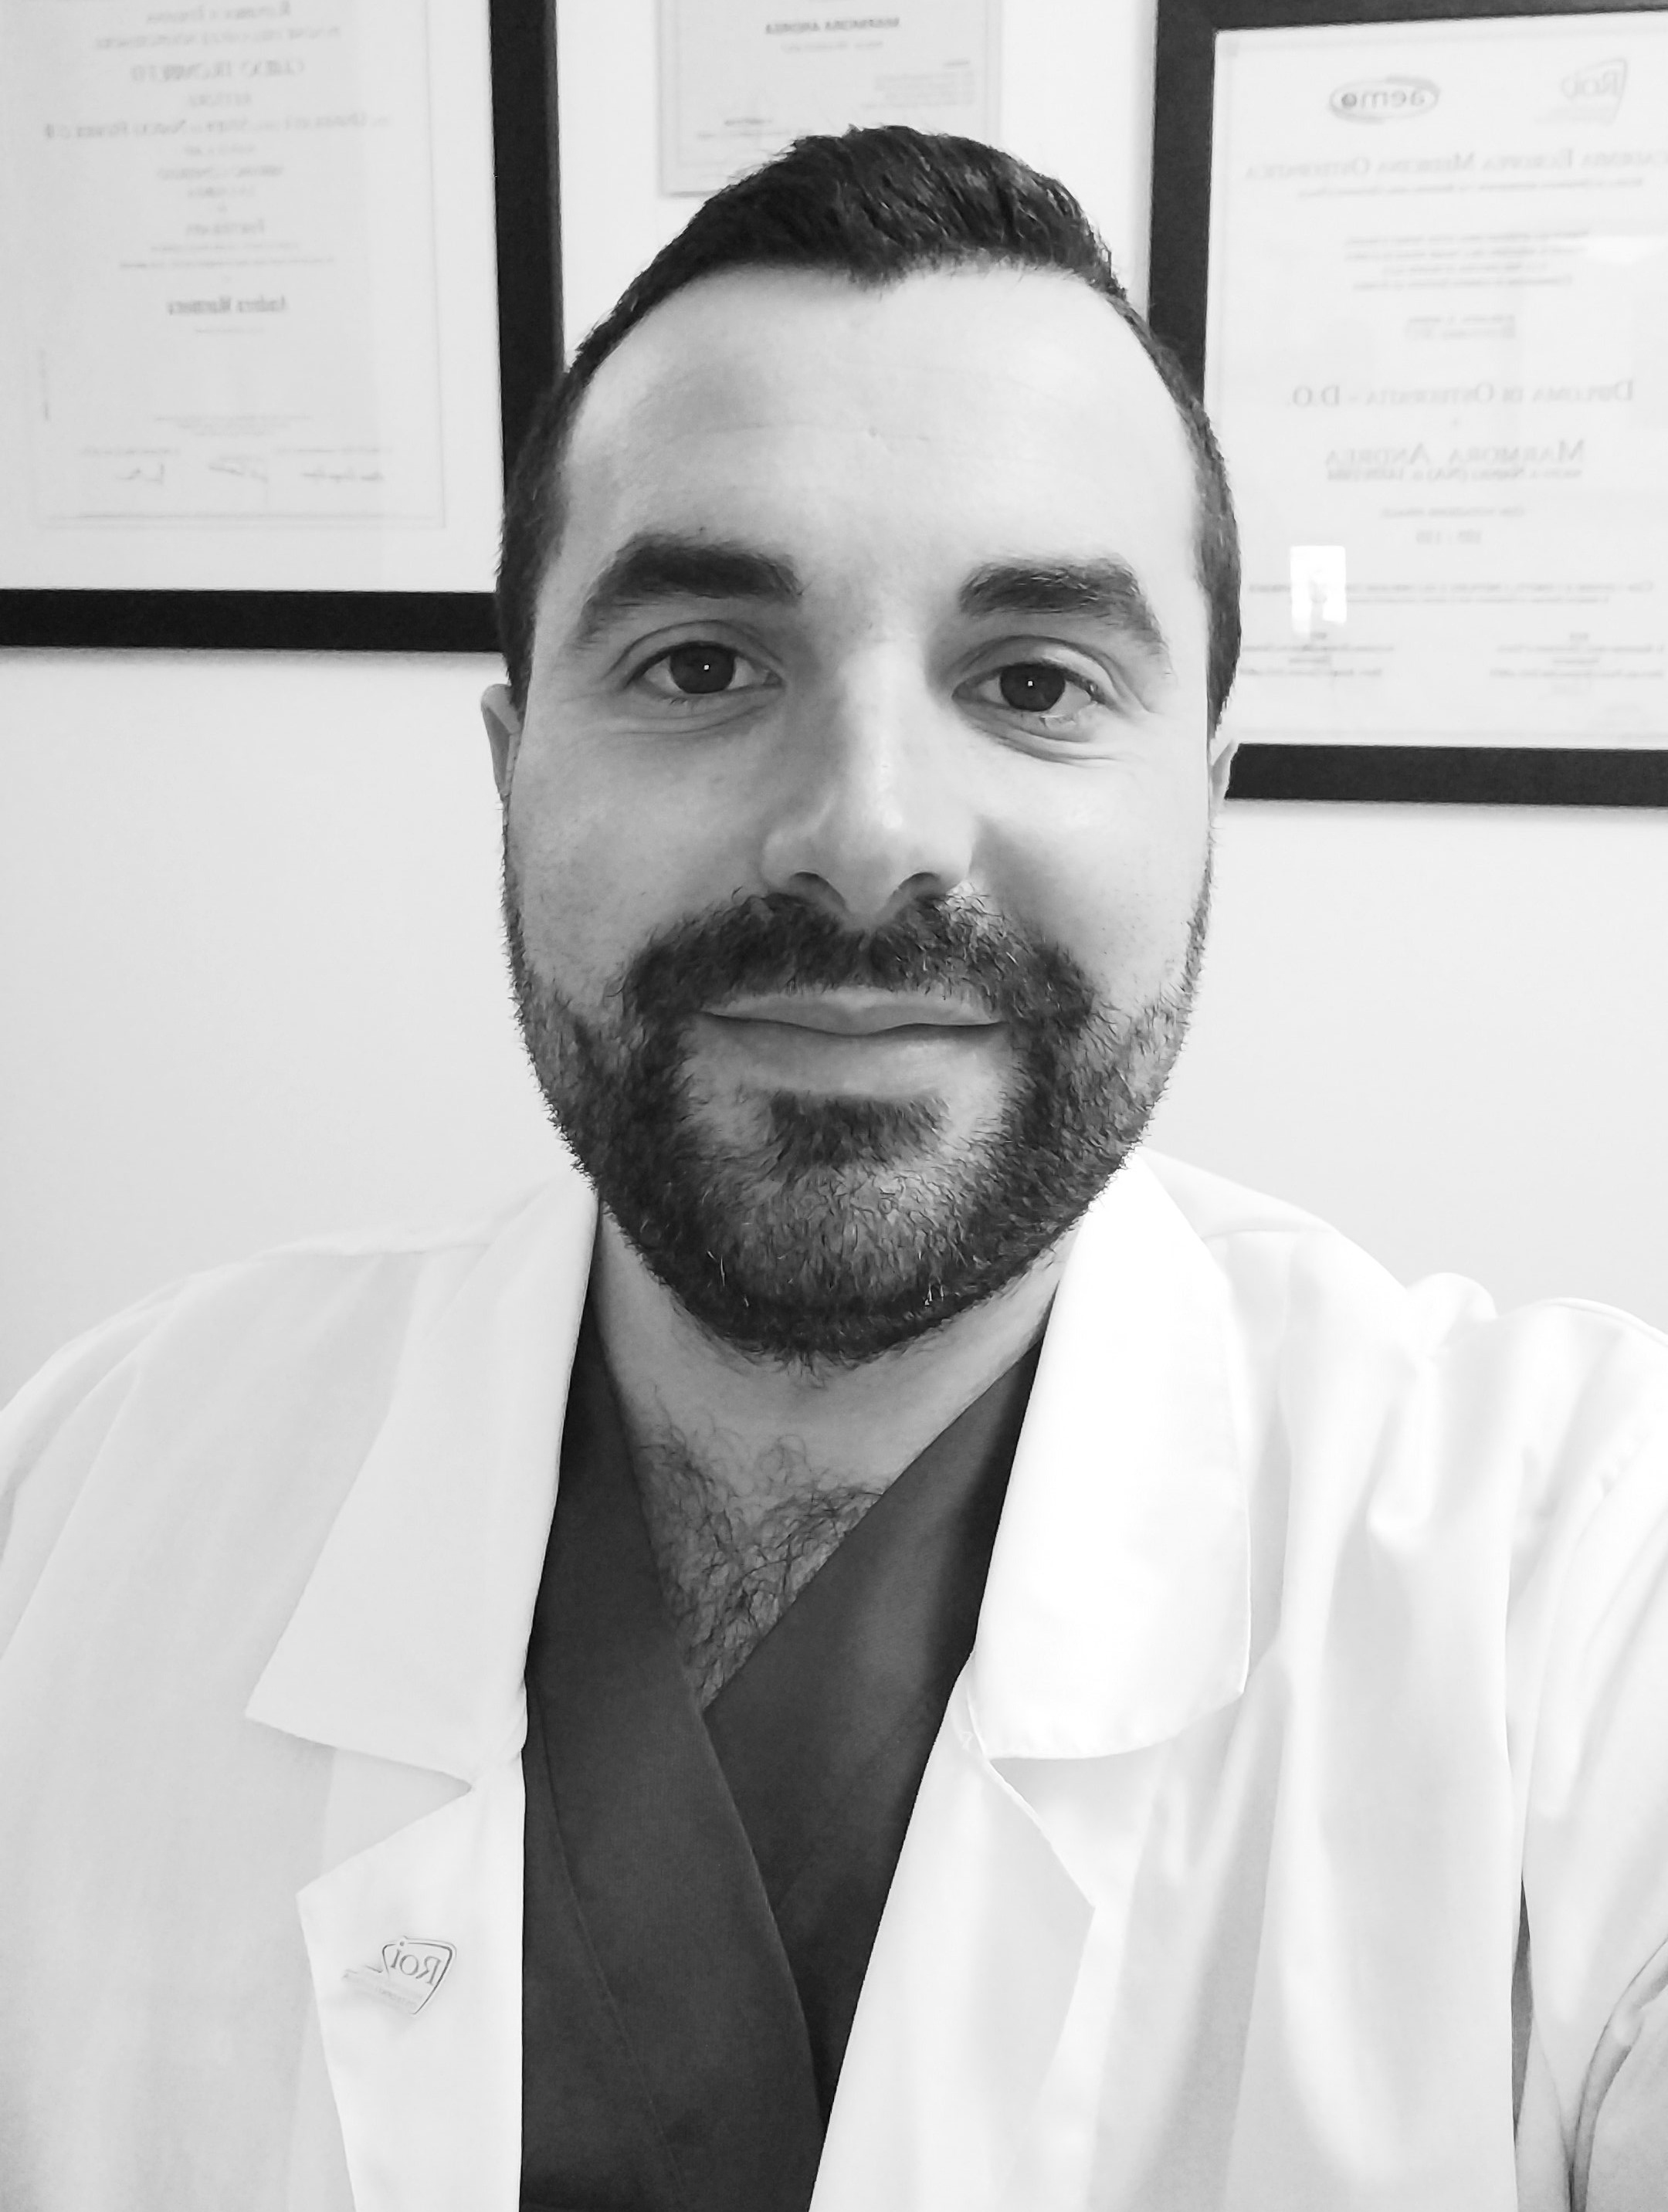 Osteopata Andrea Marmora